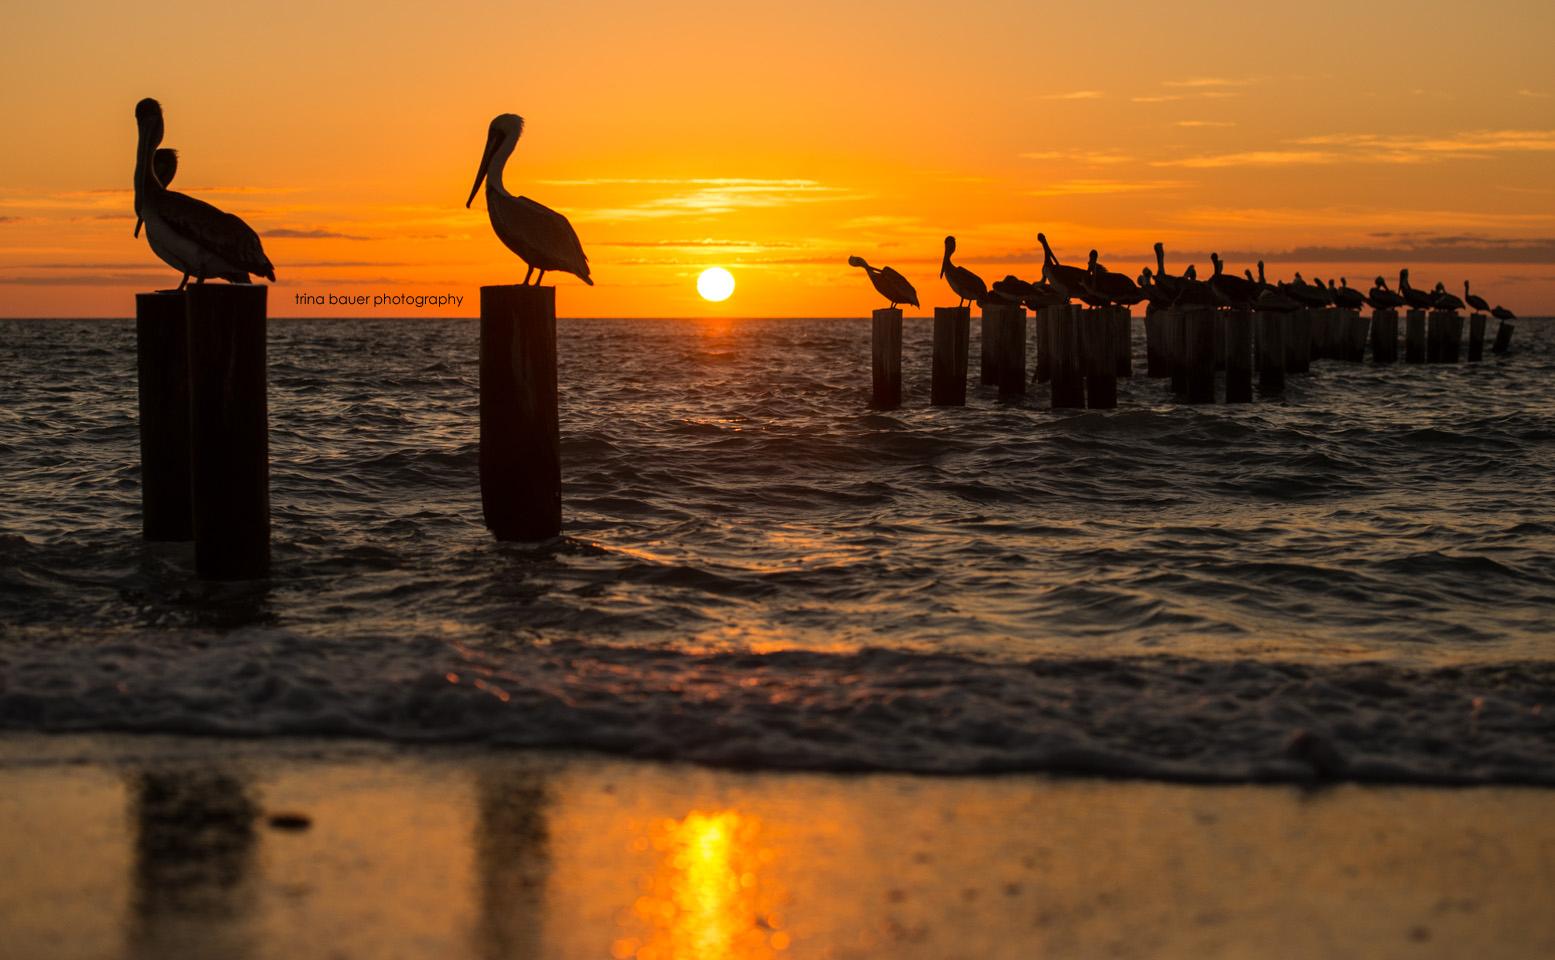 pelicans-pylon-silhouette-sunset-naples-floridafb.jpg